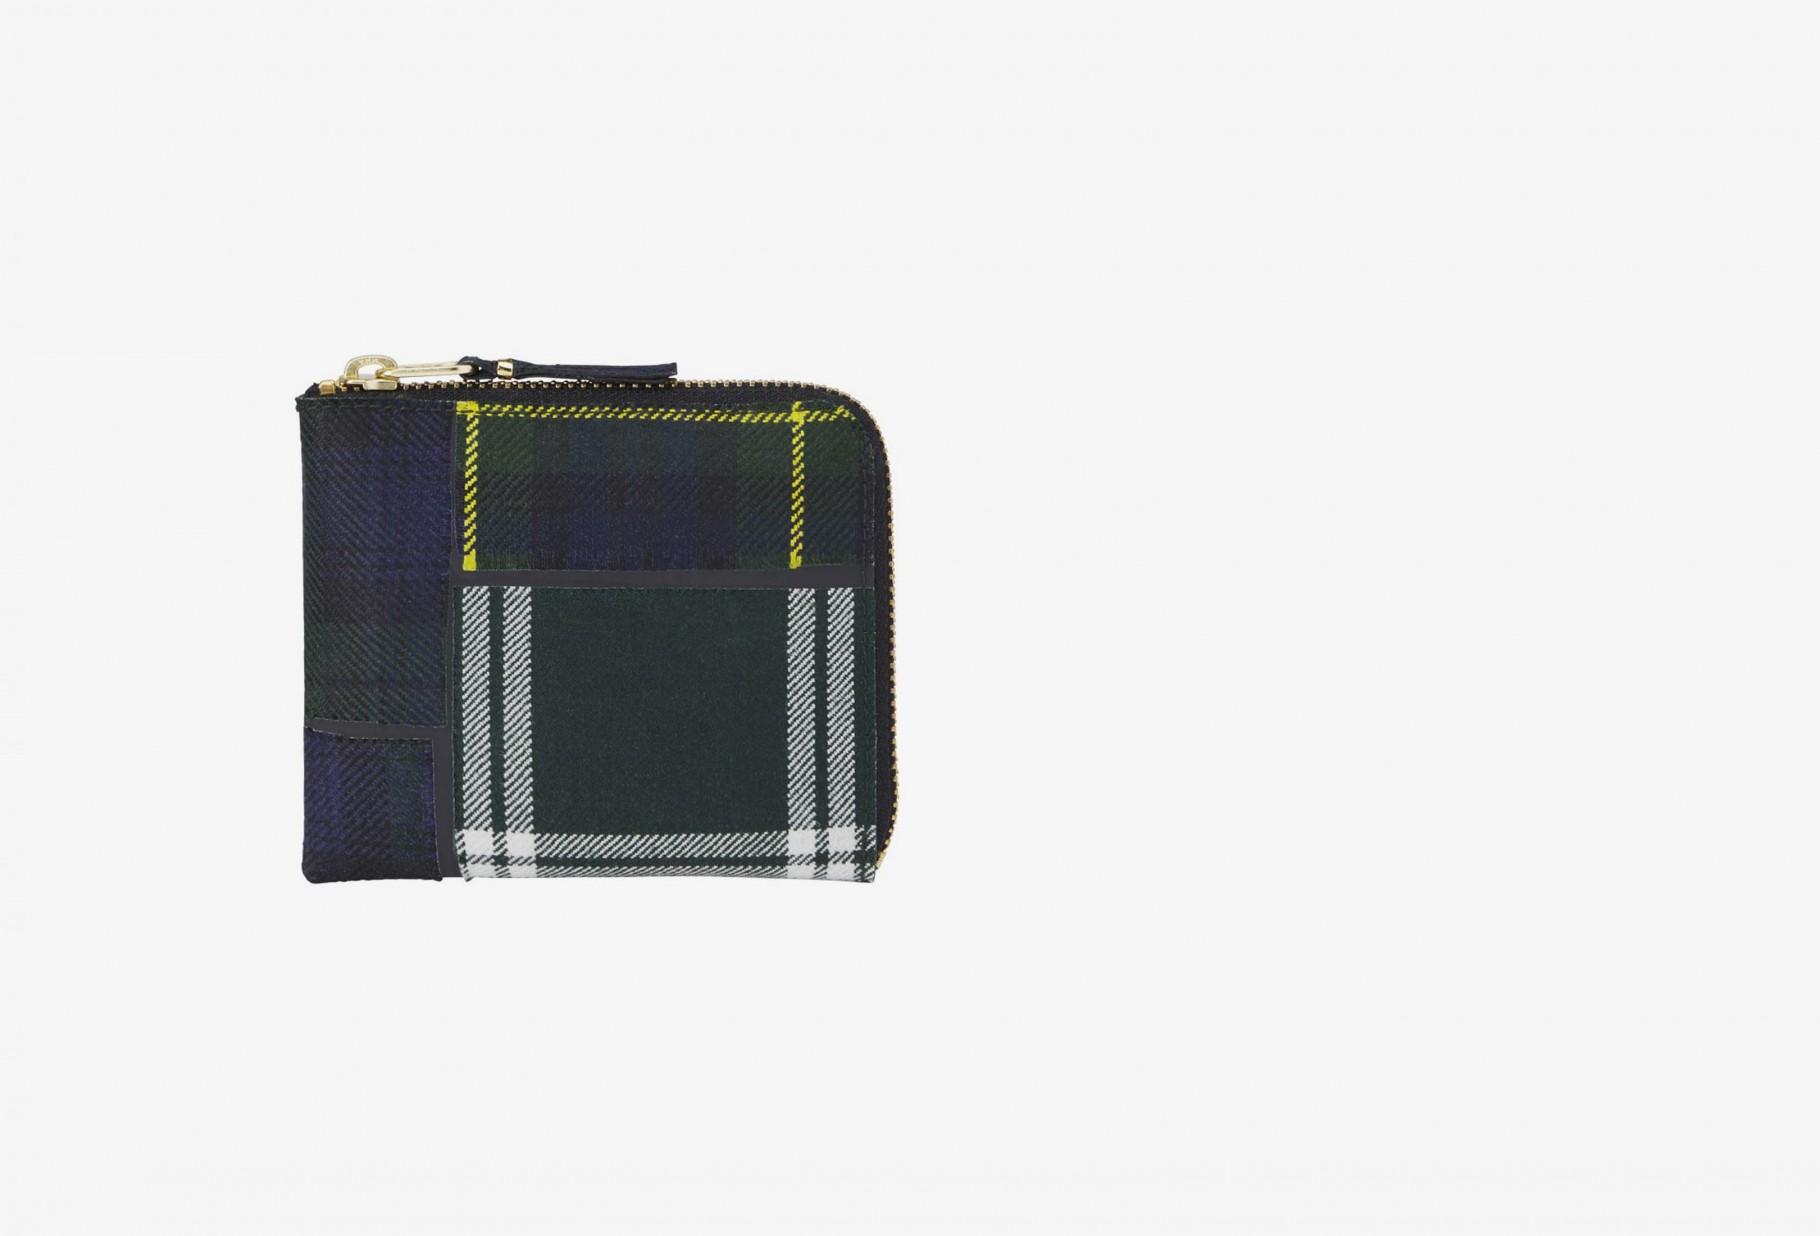 COMME DES GARÇONS WALLETS / Cdg wallet tartan patchwork Sa3100tp green